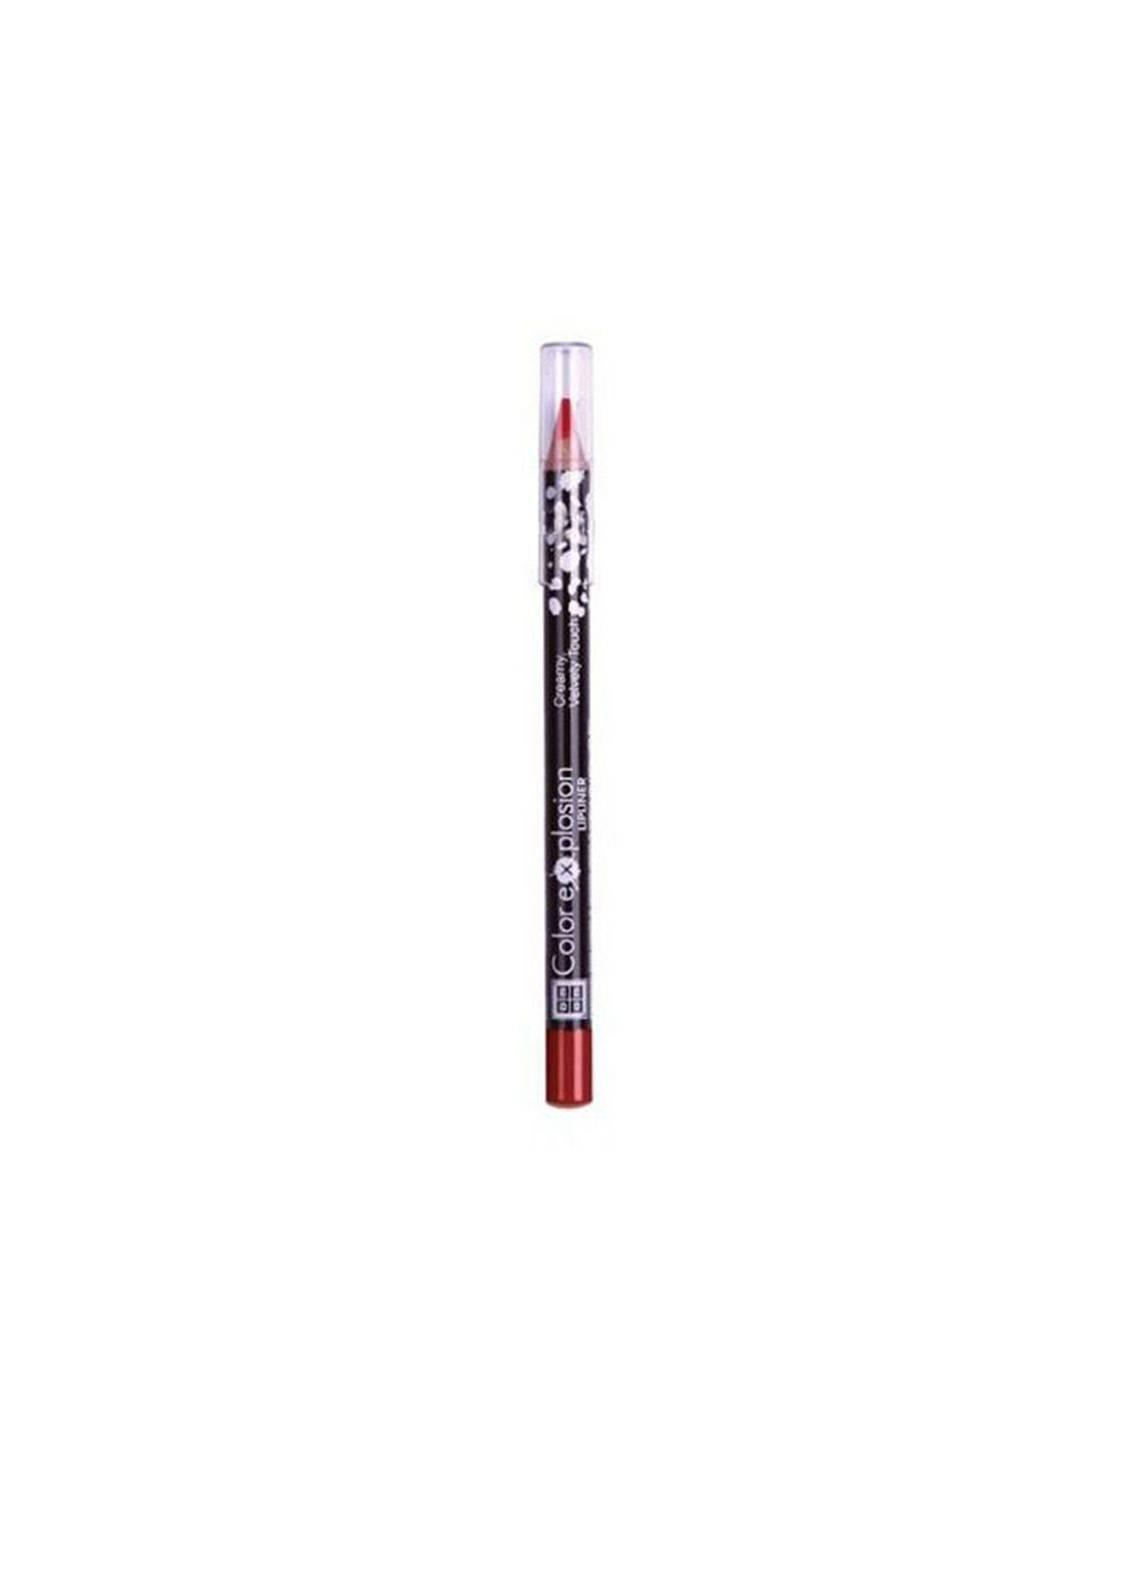 DMGM Color Explosion Lipliner - Auburn Luxury - 10